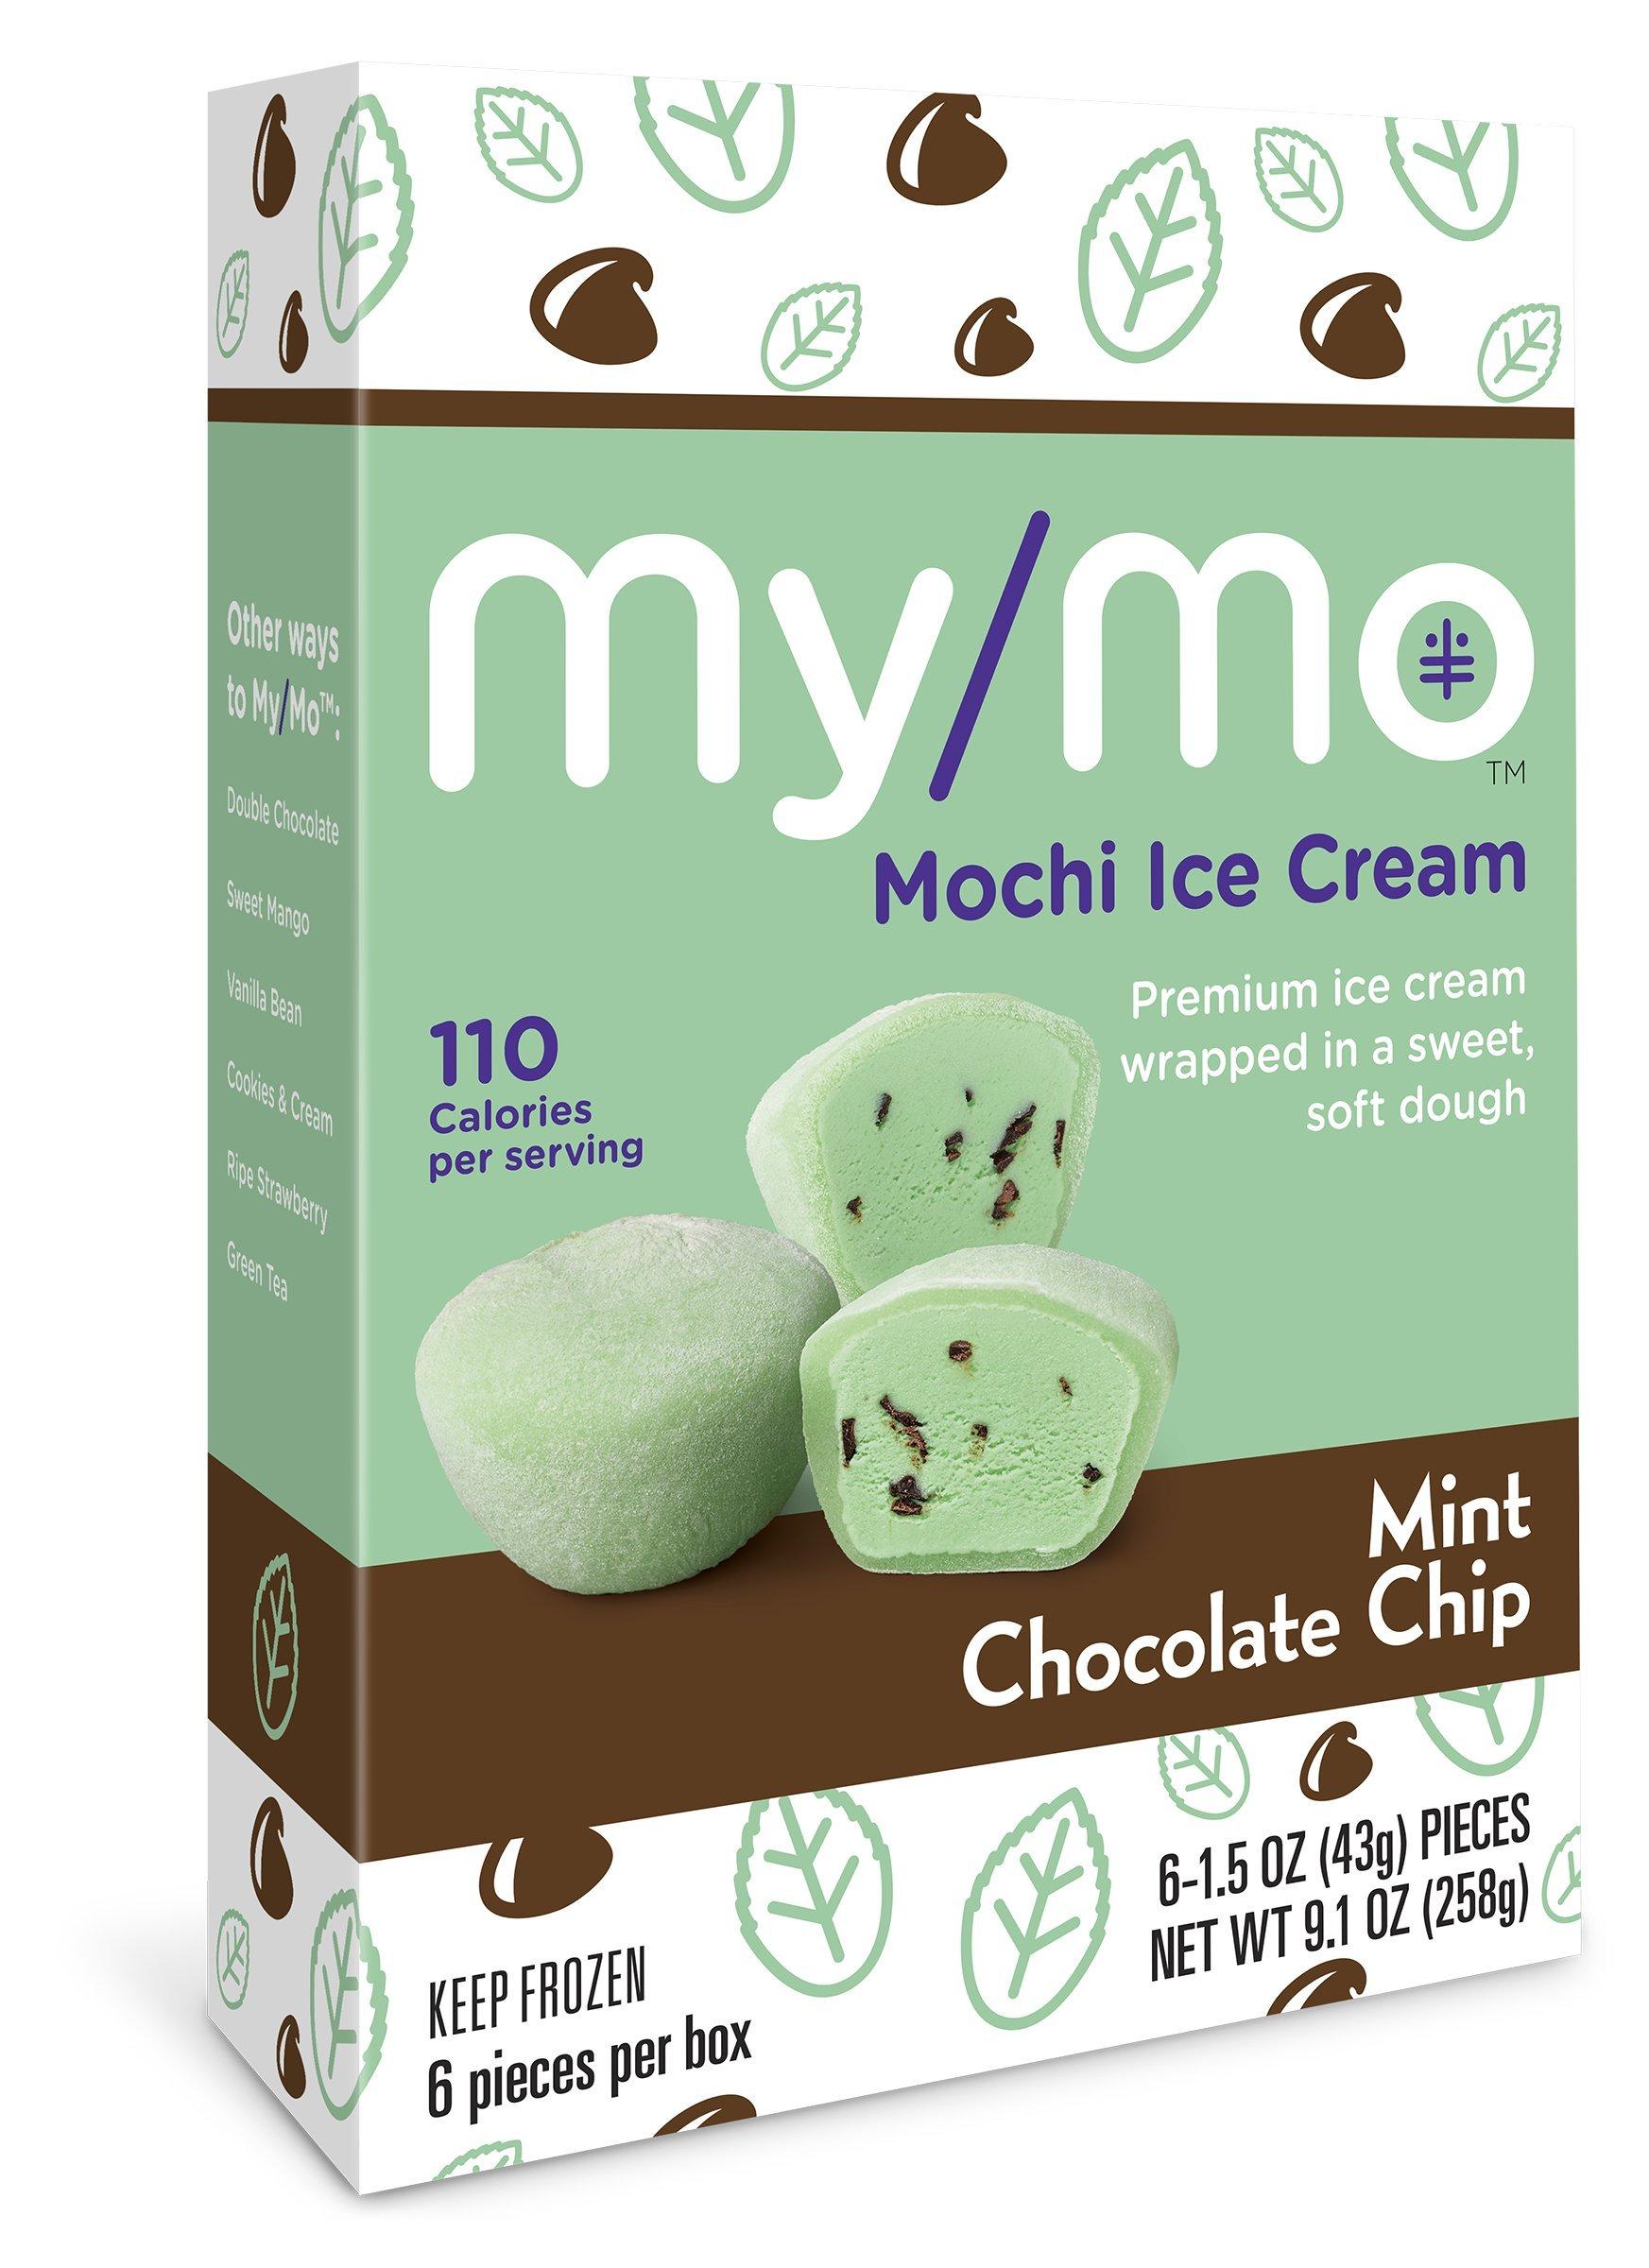 My/Mo Mint Chocolate Chip Mochi Ice Cream - 36 Mochi Ice Cream Balls (6 x 6ct. Boxes)